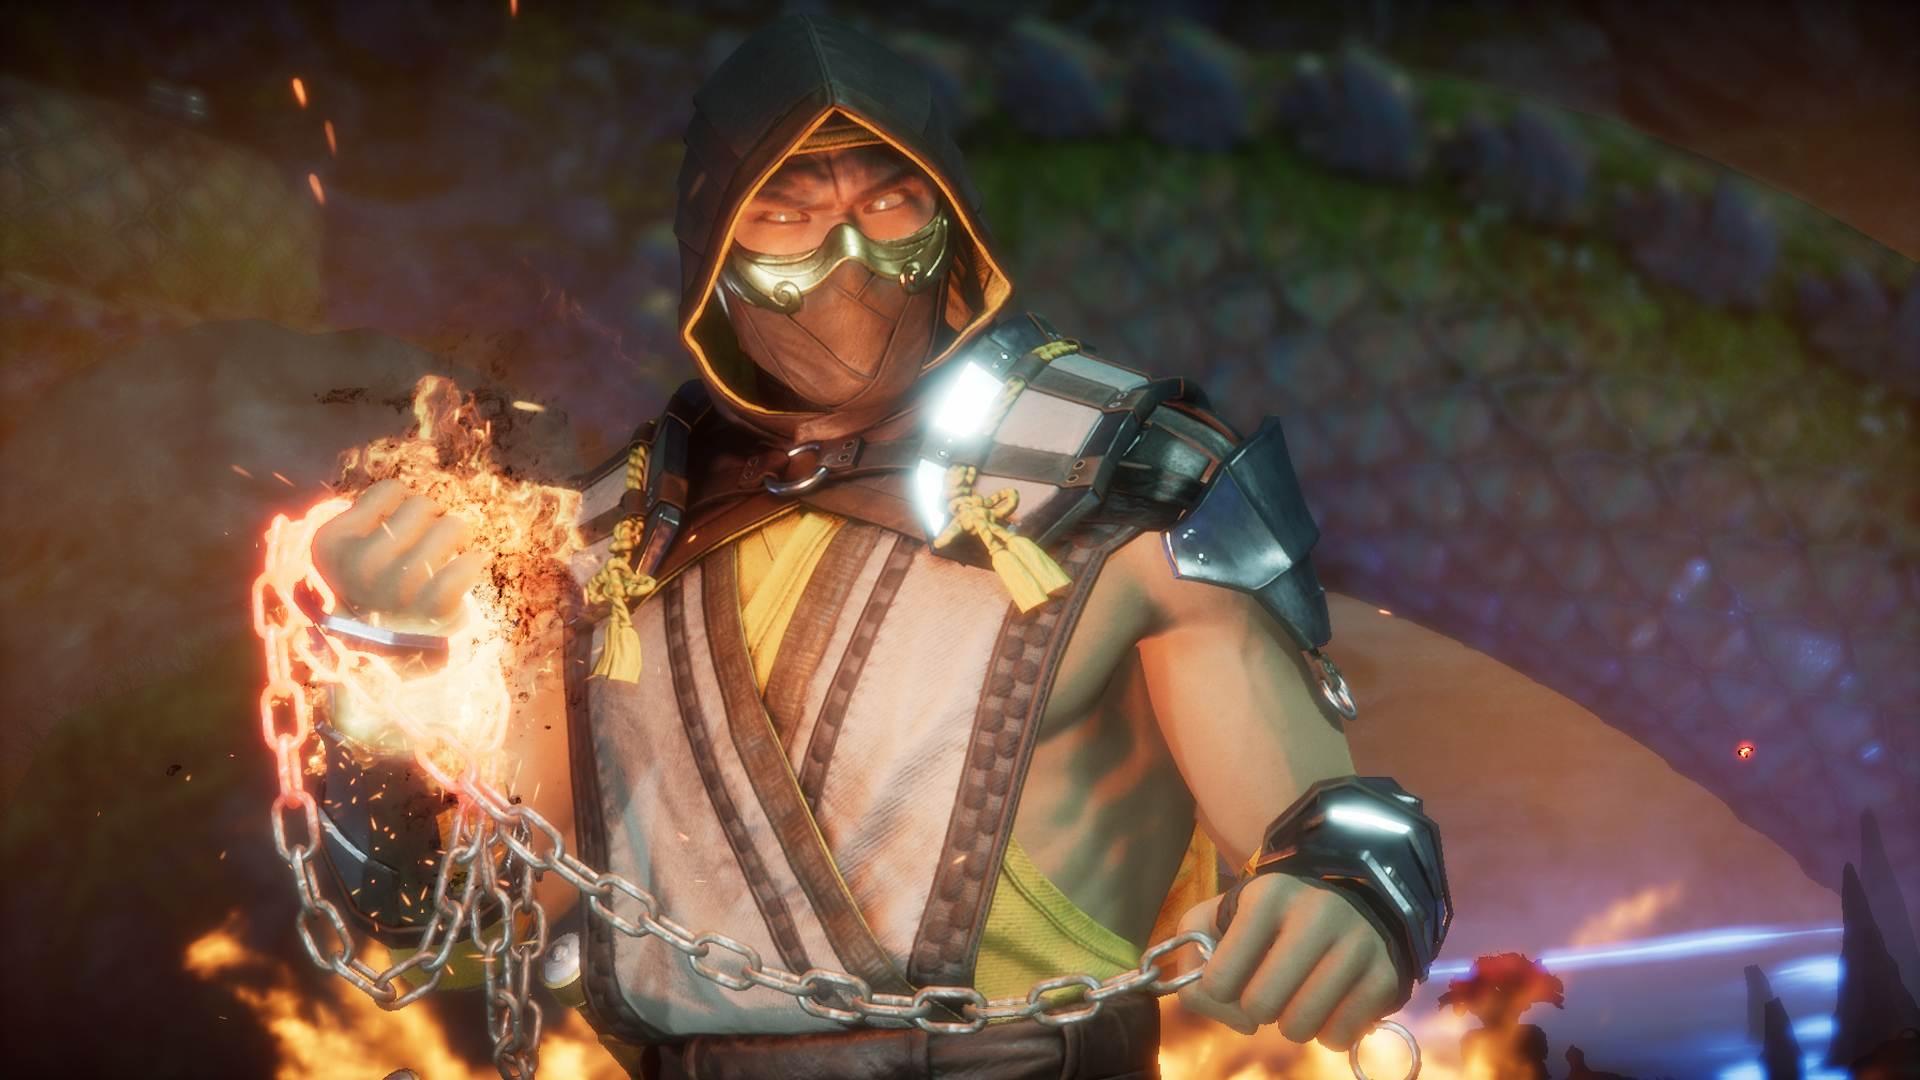 Mortal Kombat 11 Scorpion Character